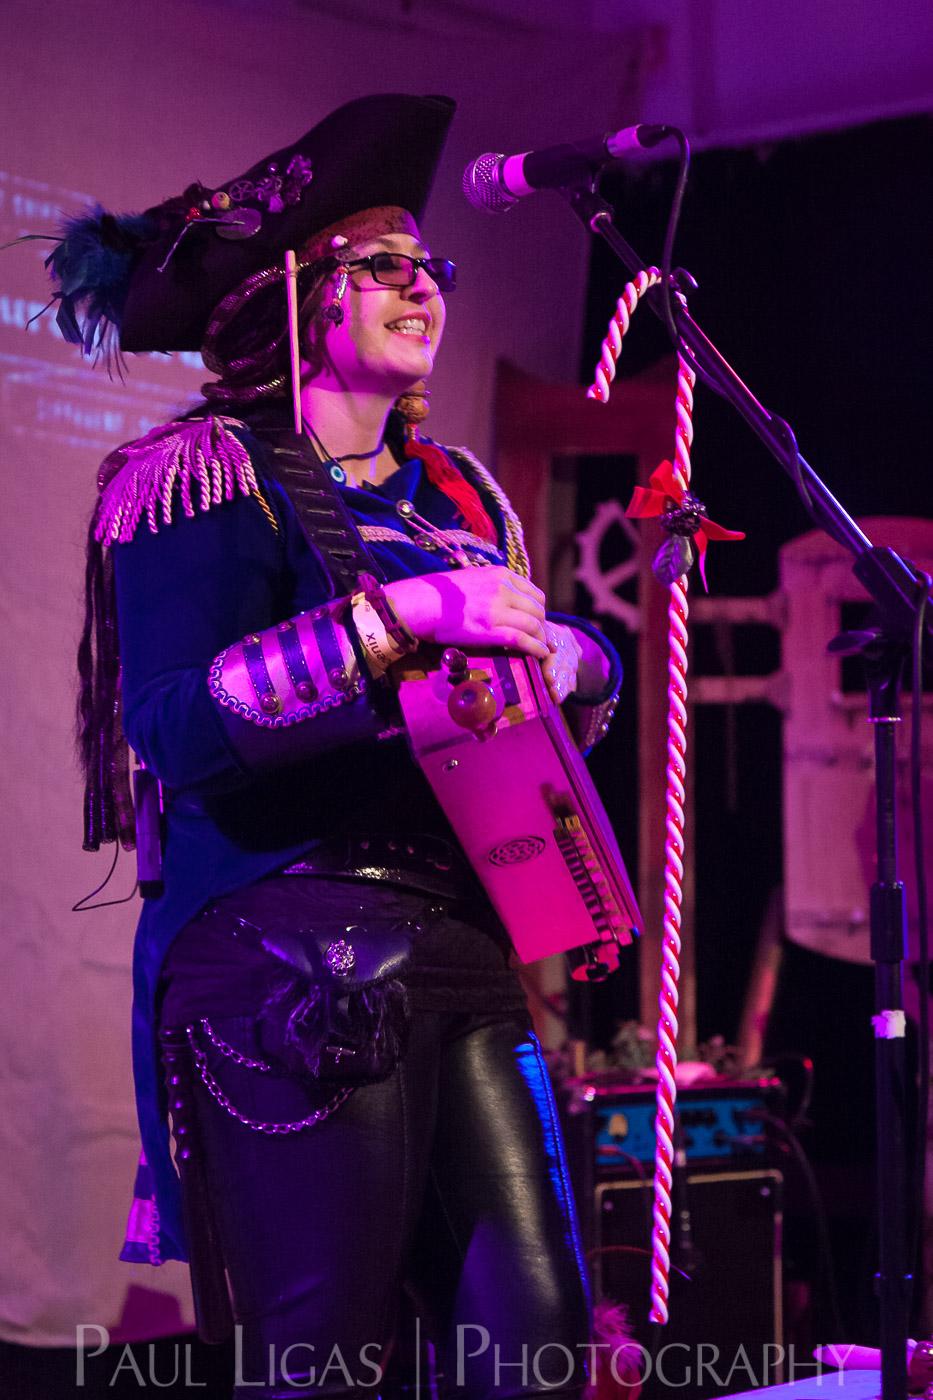 Steampunk Yule Ball 2014, event photographer photography Herefordshire music concert girdybird 6381